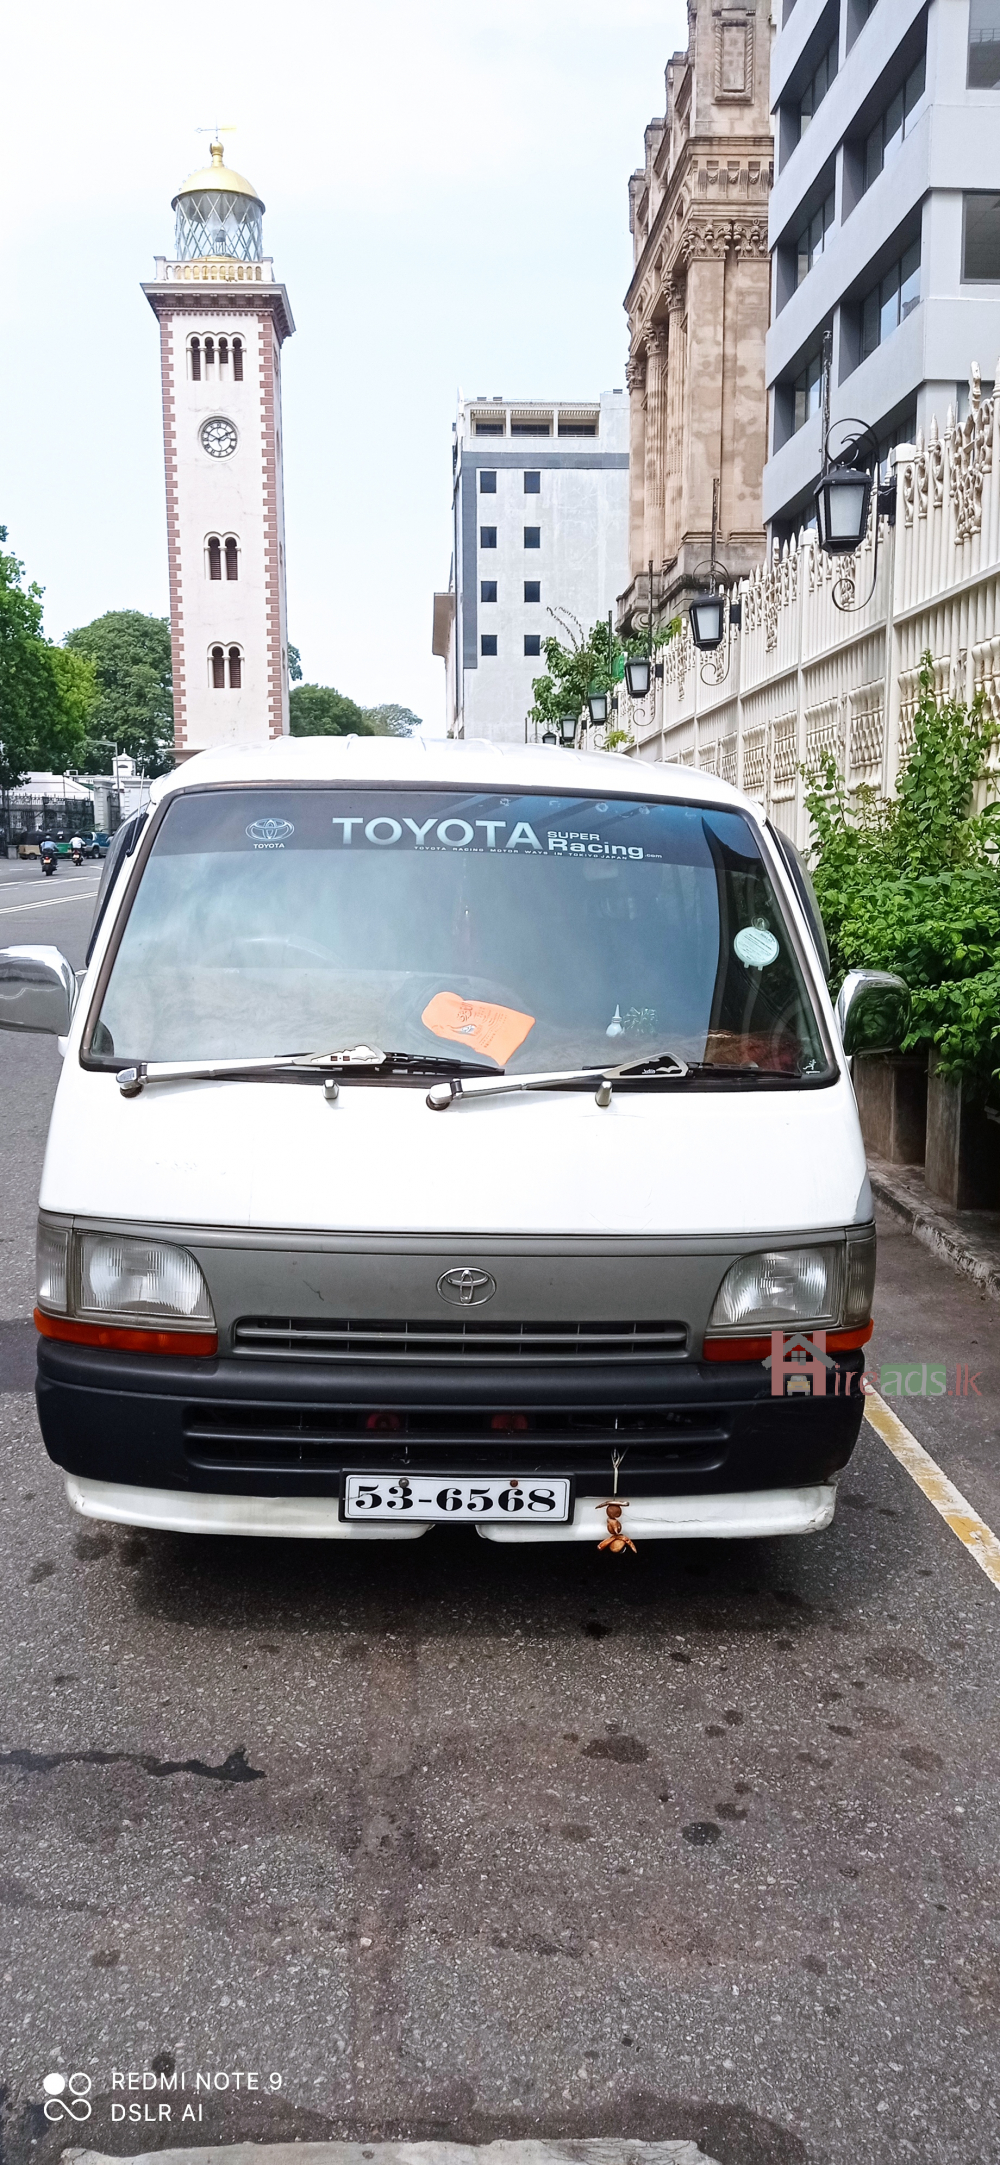 Toyota Hiace van - කොලඹ